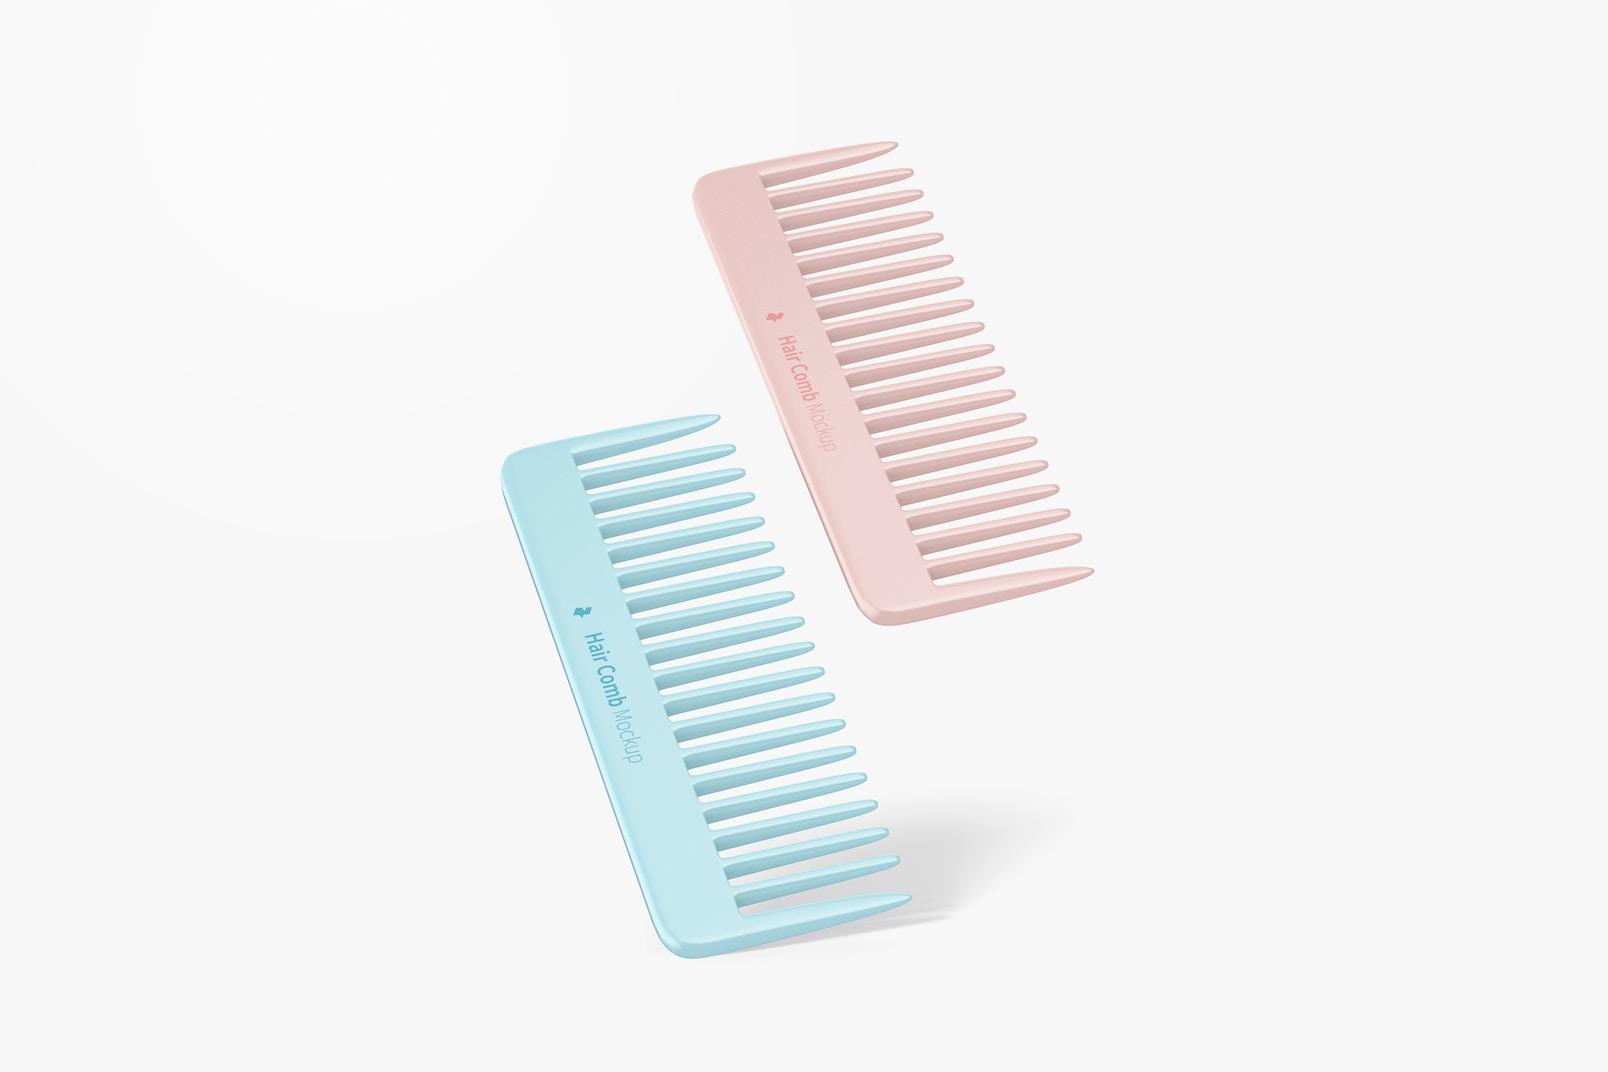 Hair Combs Mockup, Floating